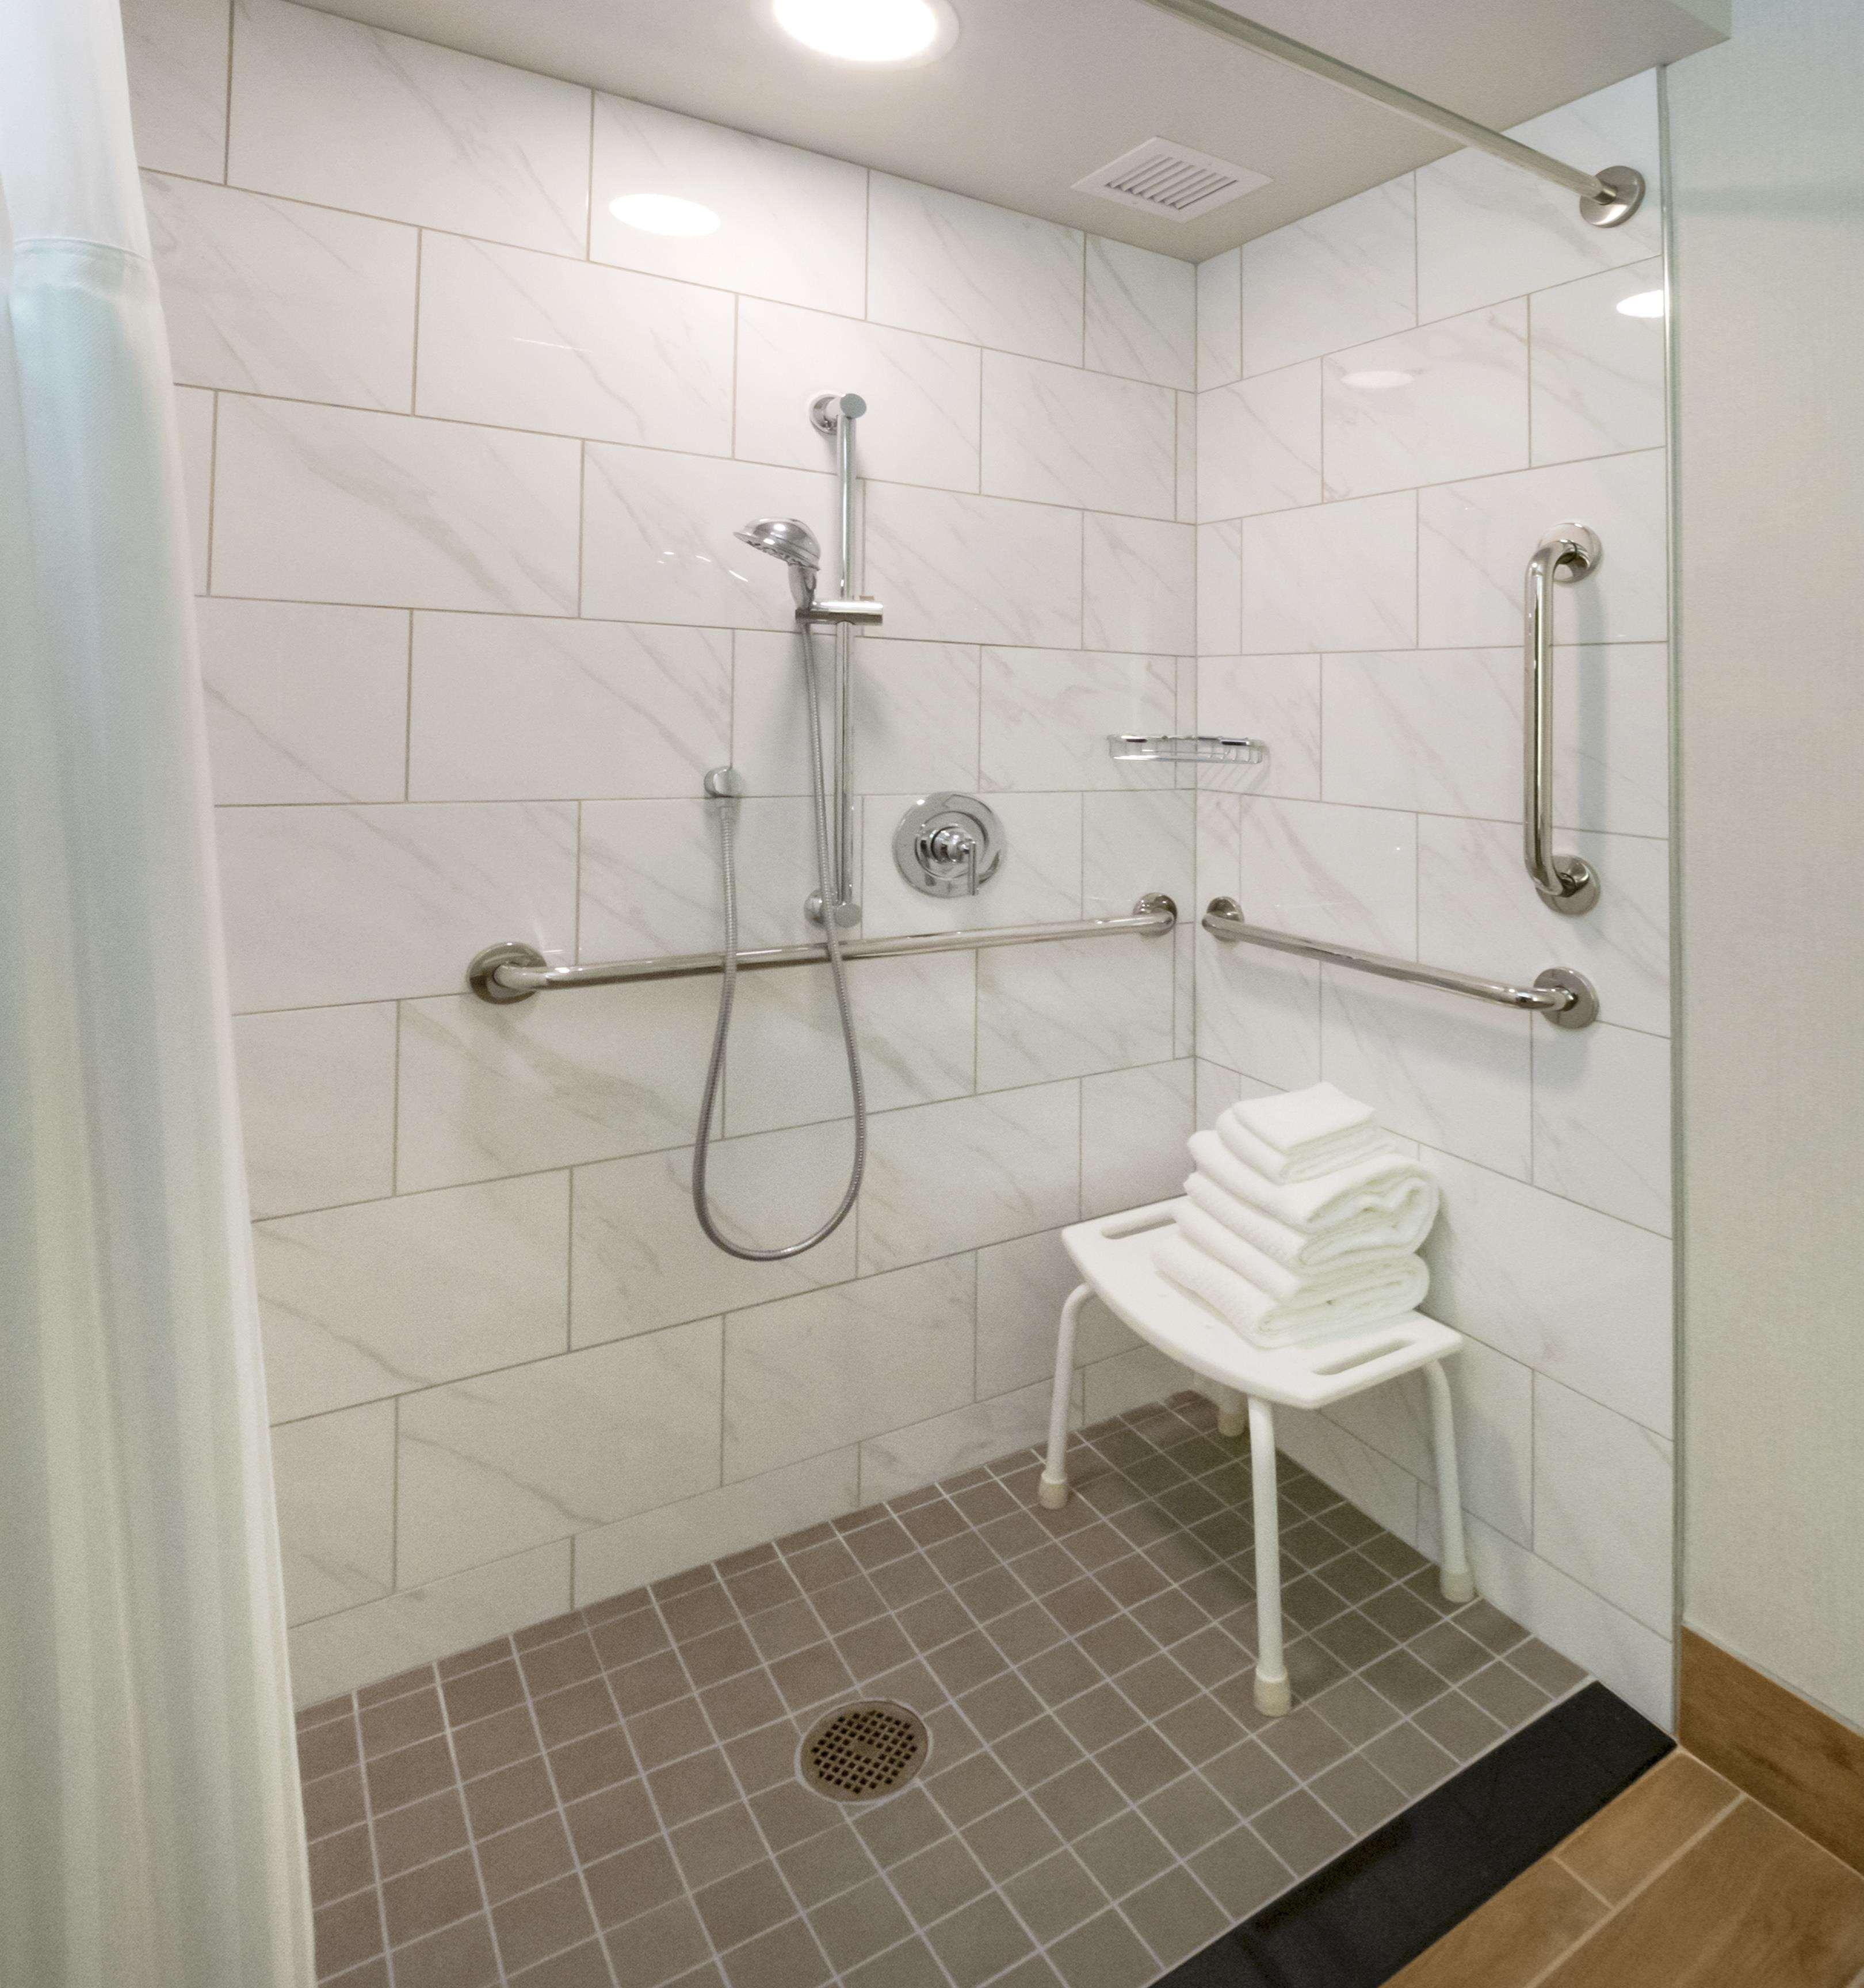 DoubleTree by Hilton Jamestown image 19